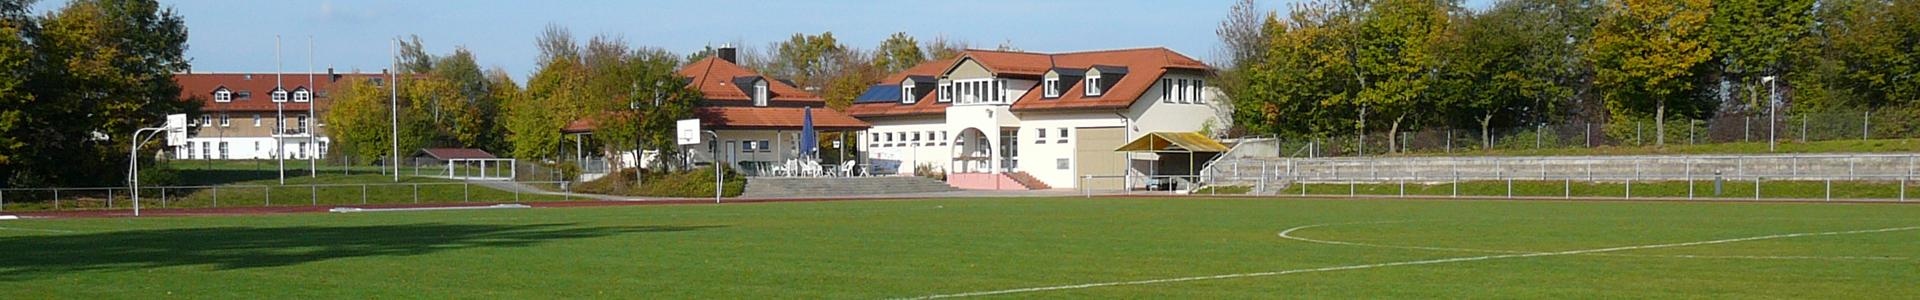 SCPP Sport Club Pöcking Possenhofen